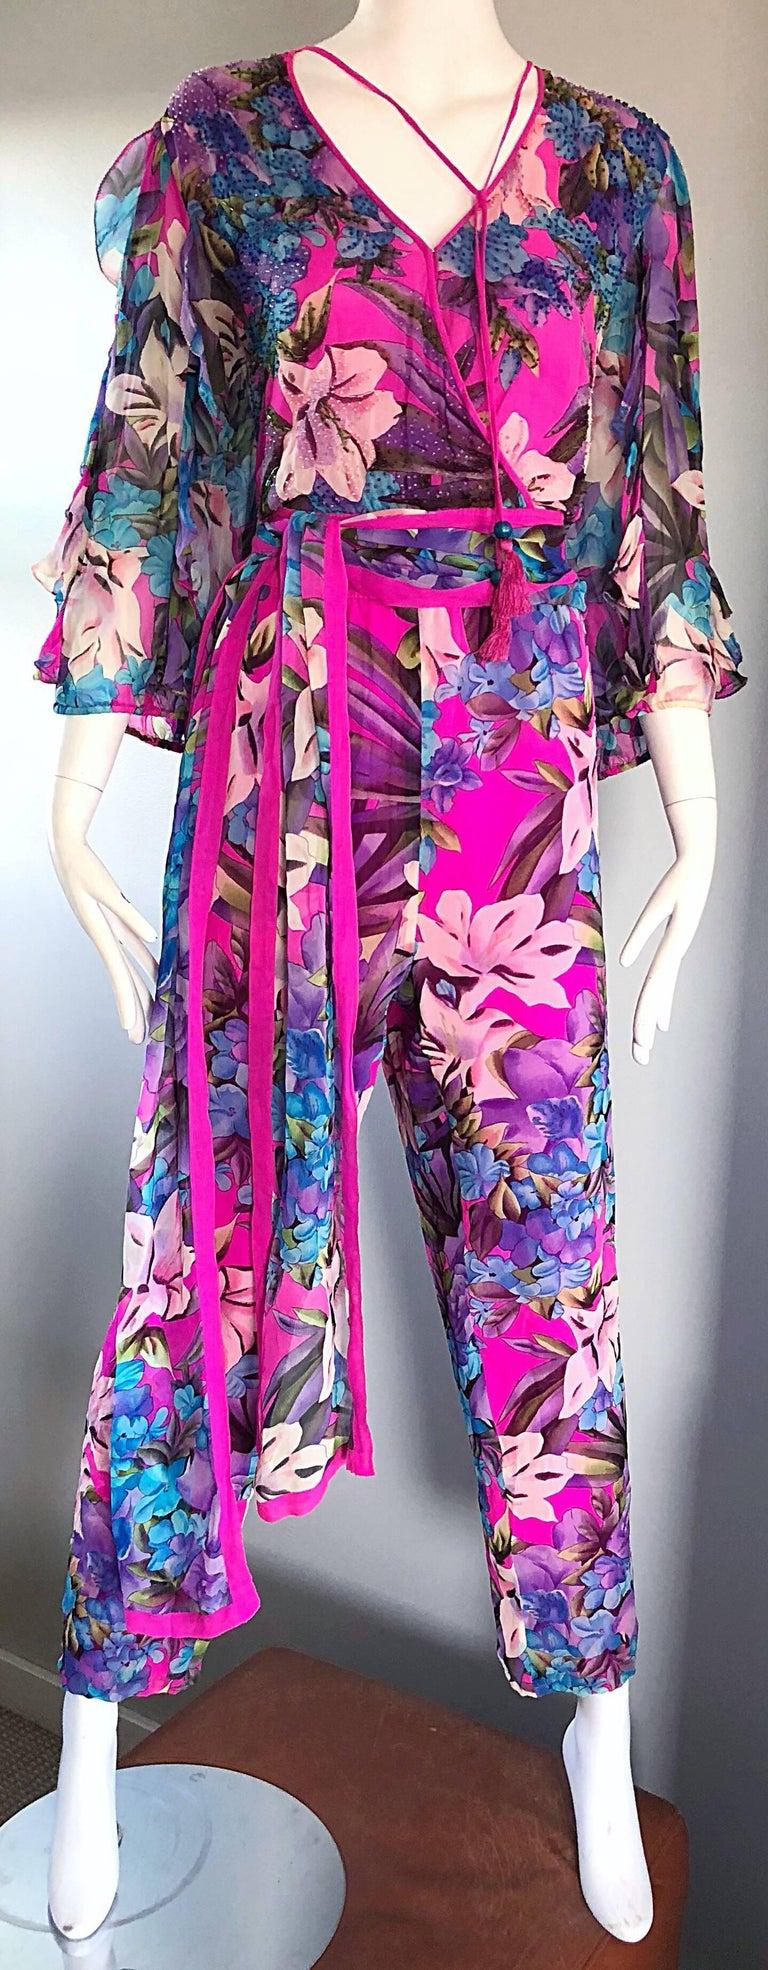 Women's Amazing Vintage Diane Freis Silk Chiffon Beaded Pink Jumpsuit & Head Scarf Sash  For Sale